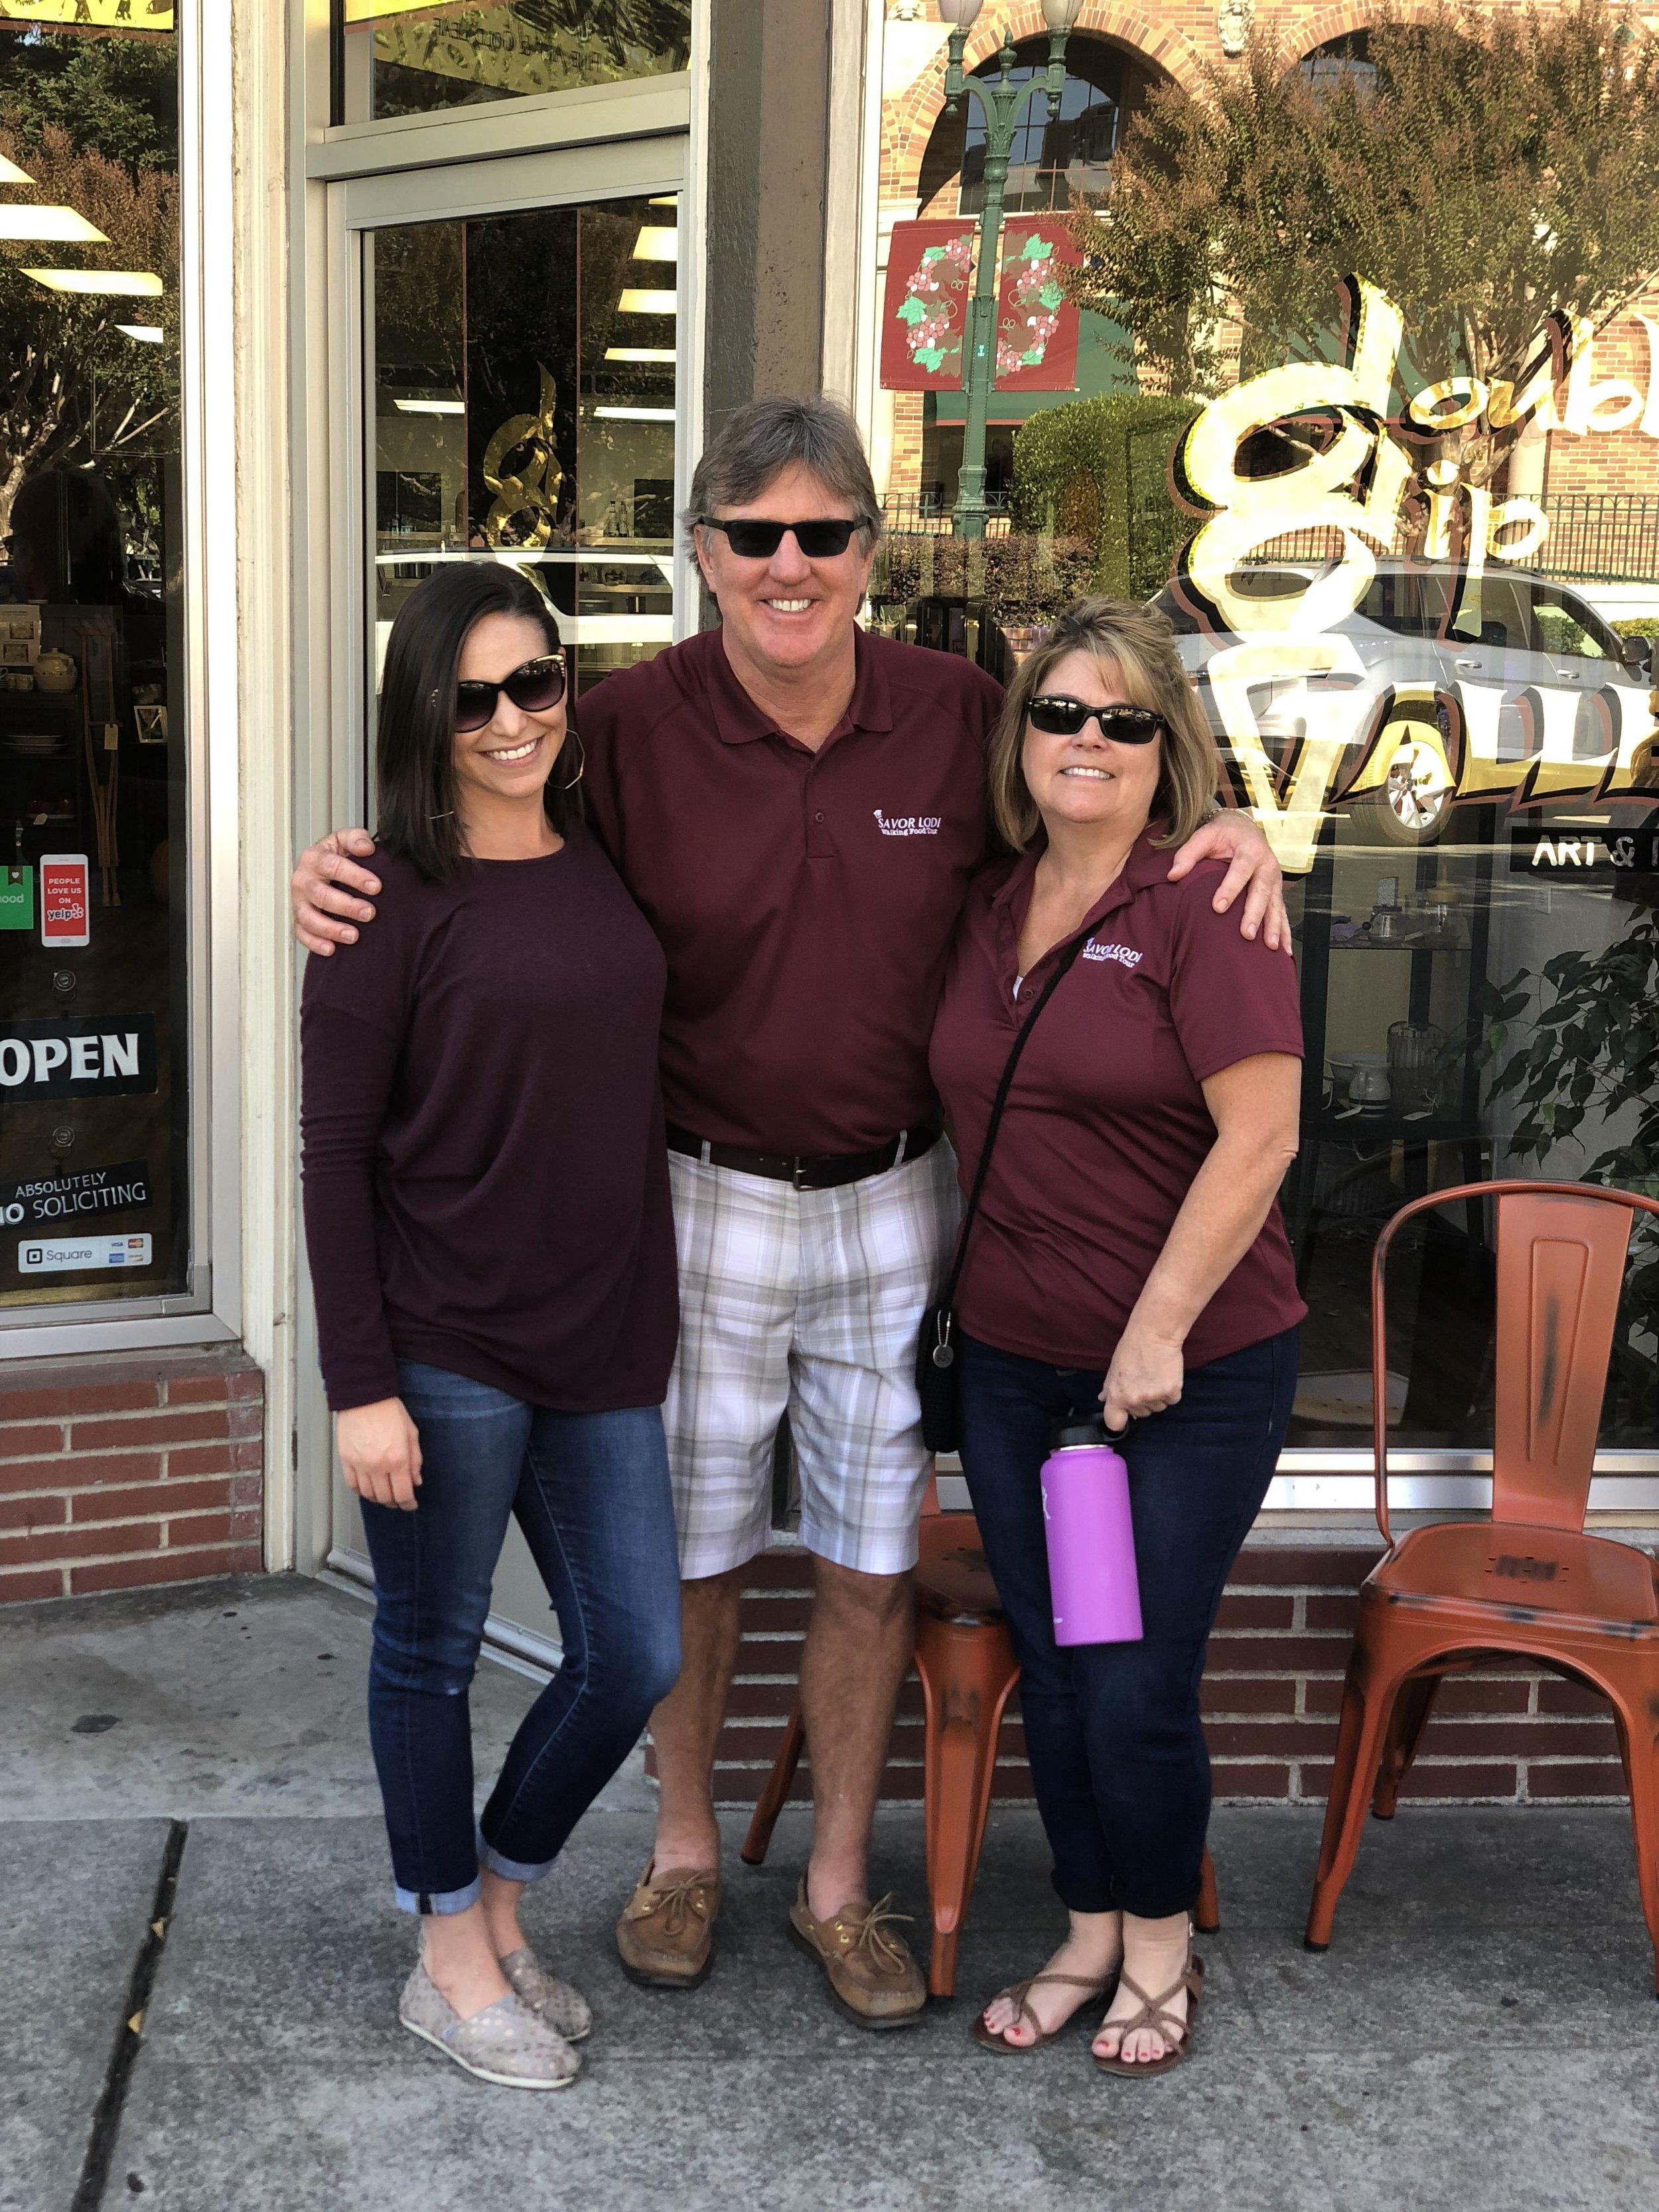 Scott & Juliette Fyffe, Savor Lodi Owners, and Jamie, Lodi Live Owner